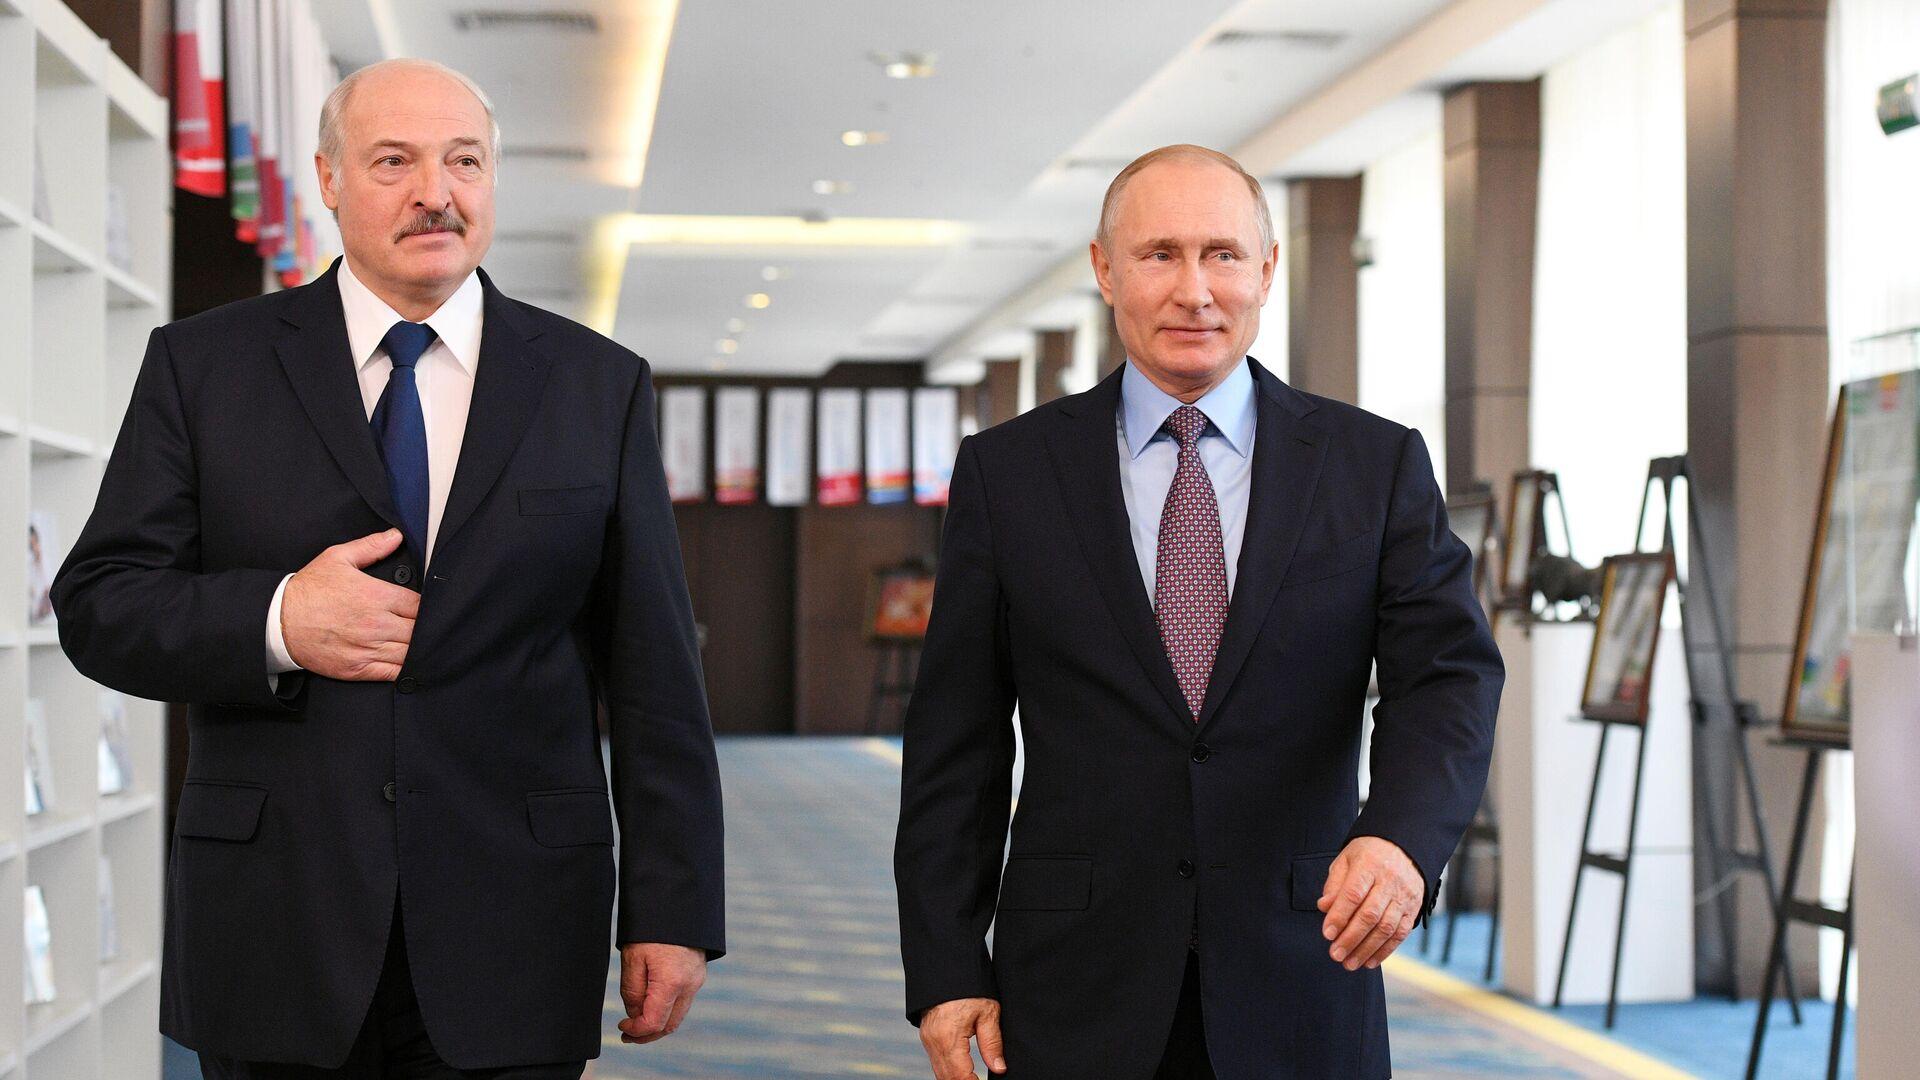 Президент РФ Владимир Путин и президент Белоруссии Александр Лукашенко - РИА Новости, 1920, 10.02.2021